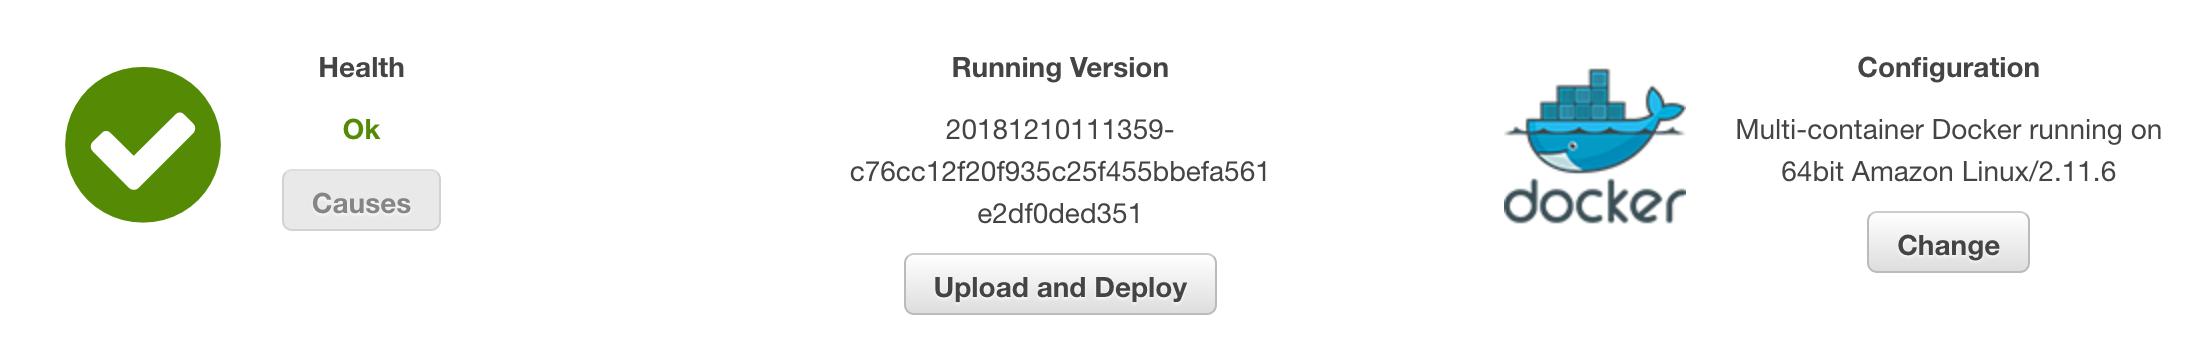 Run Tensorflow scripts from Node js server deployed on AWS